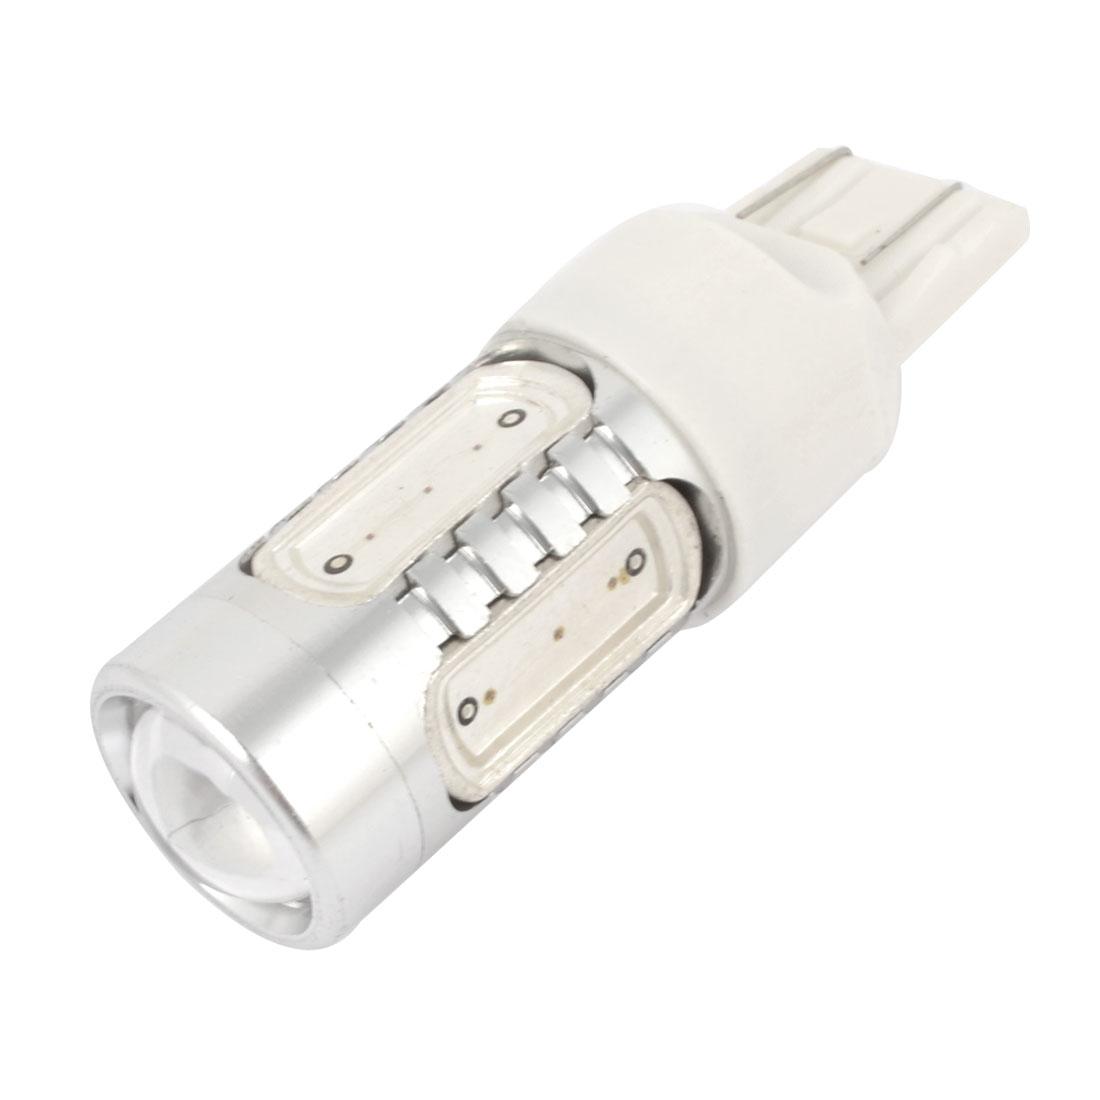 11W 5 LED 7440 7443 T20 Bulb Signal Stop Brake Tail Rear Light Red